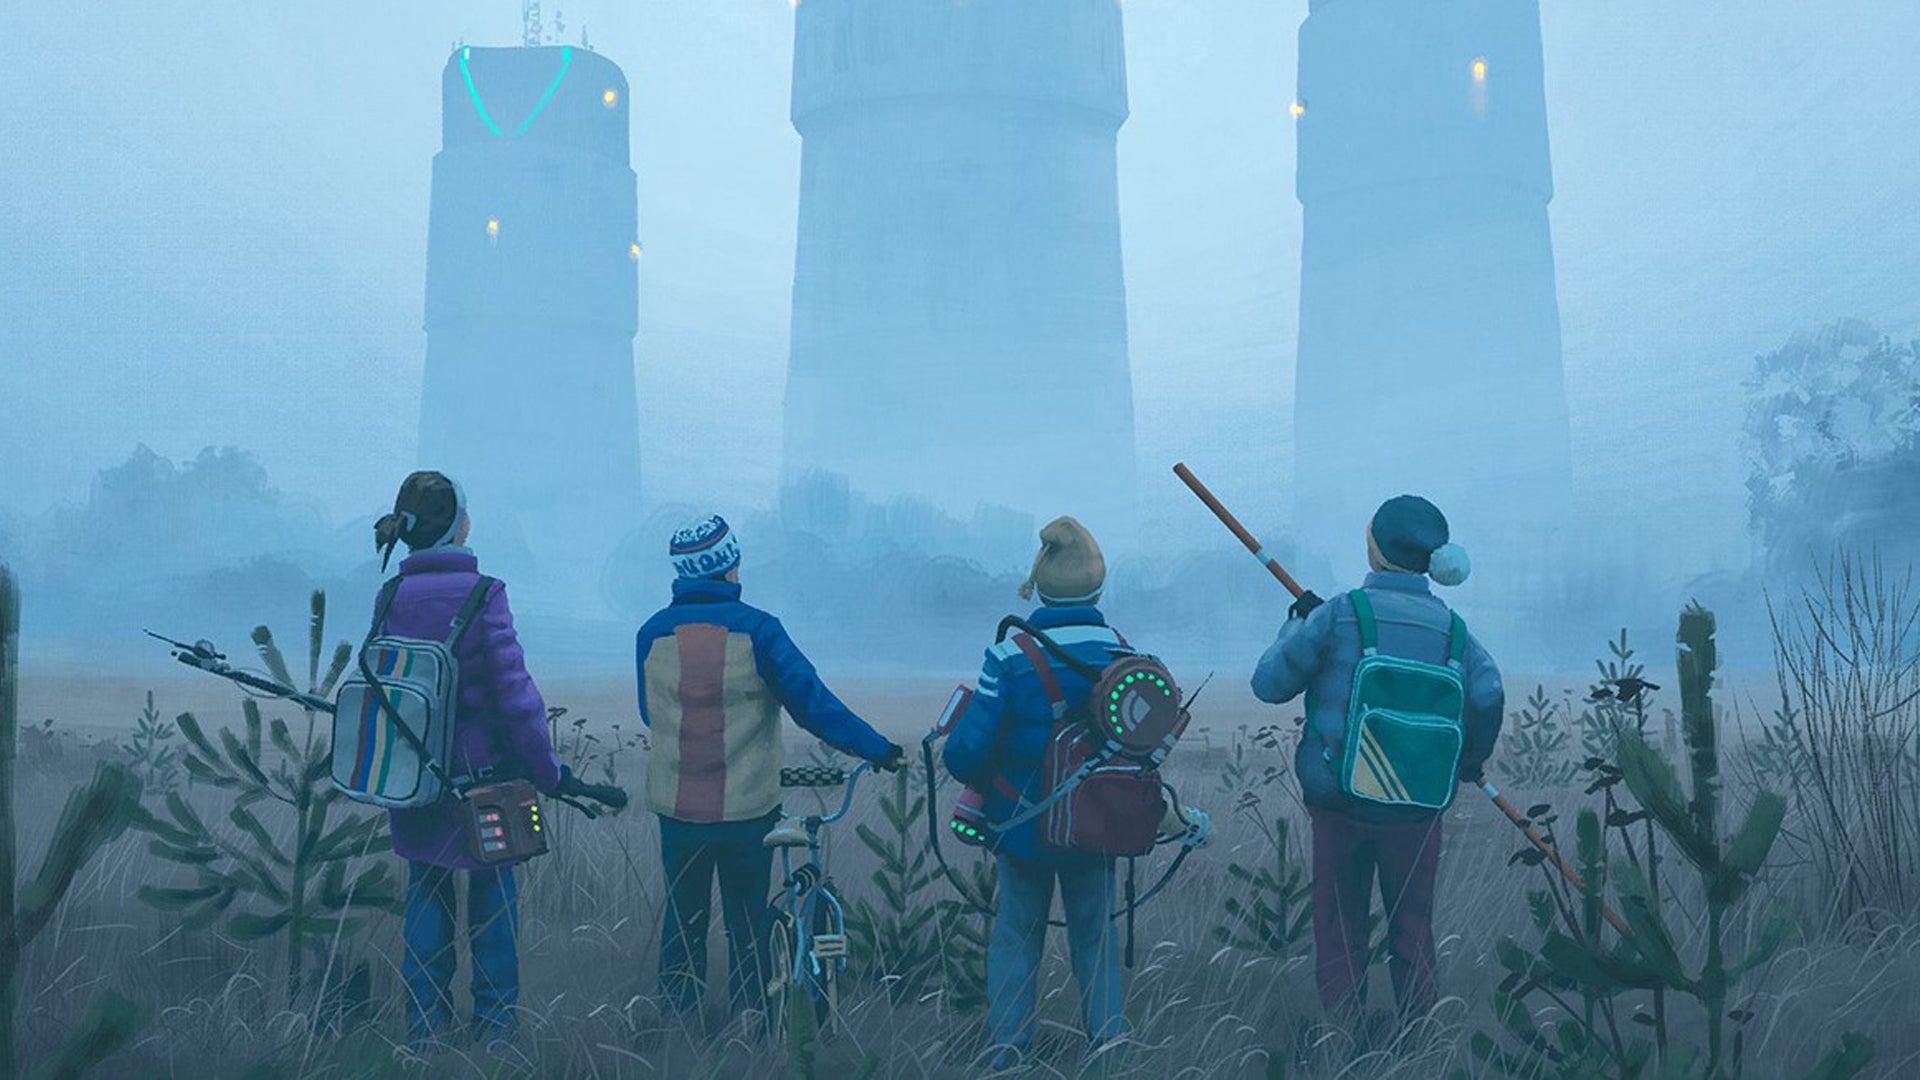 Tales from the Loop artwork